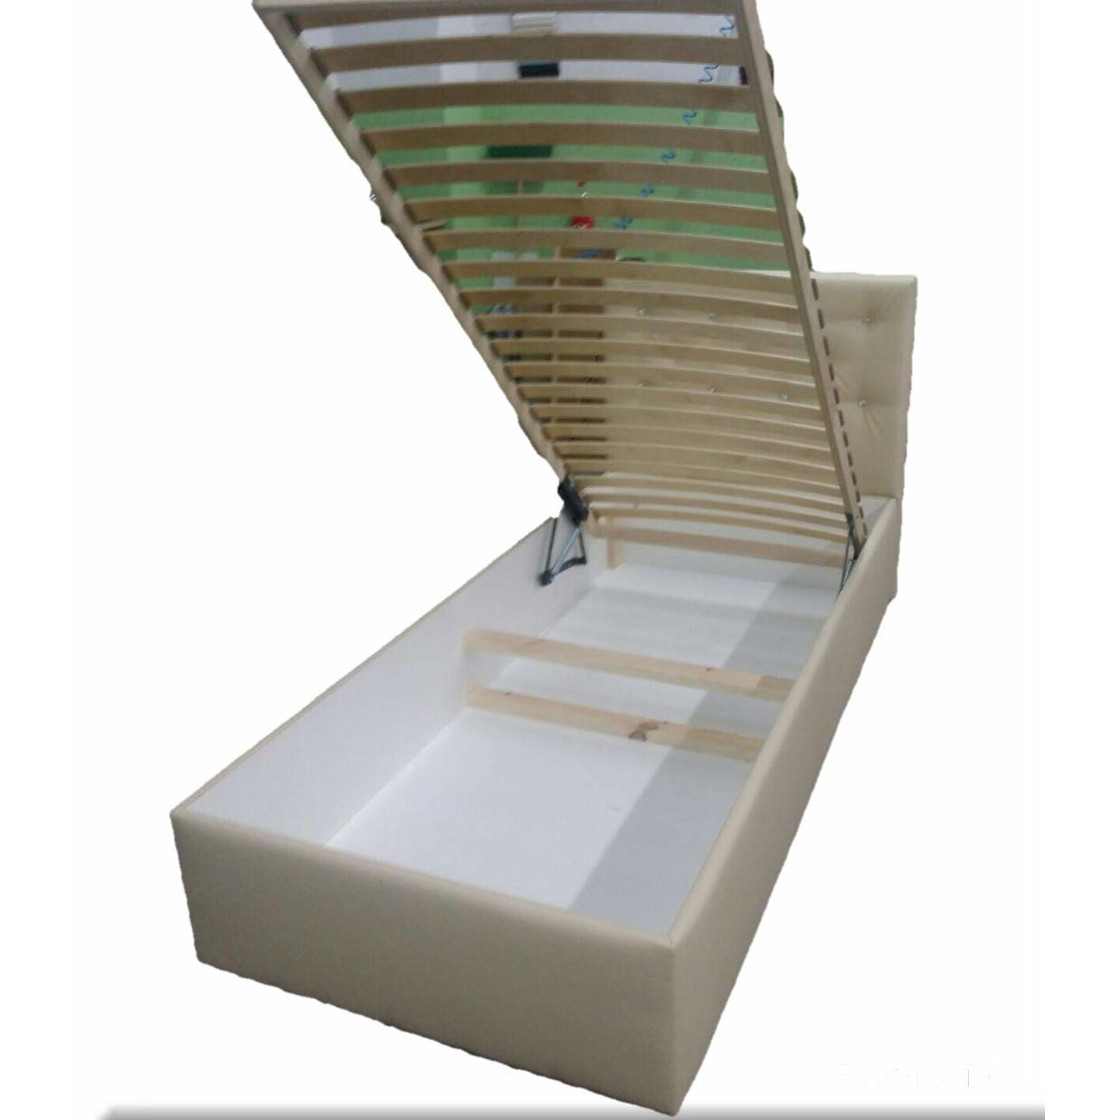 Full Size of Bett Bettkasten 120x200 Holzbett Mit Boxspring Holz 140x200 180x200 Ikea 200x200 Betten 140 200 Boxspringbett Style Liegeflche 90x200 Weiße Ohne Füße Hoch Bett Bett Bettkasten